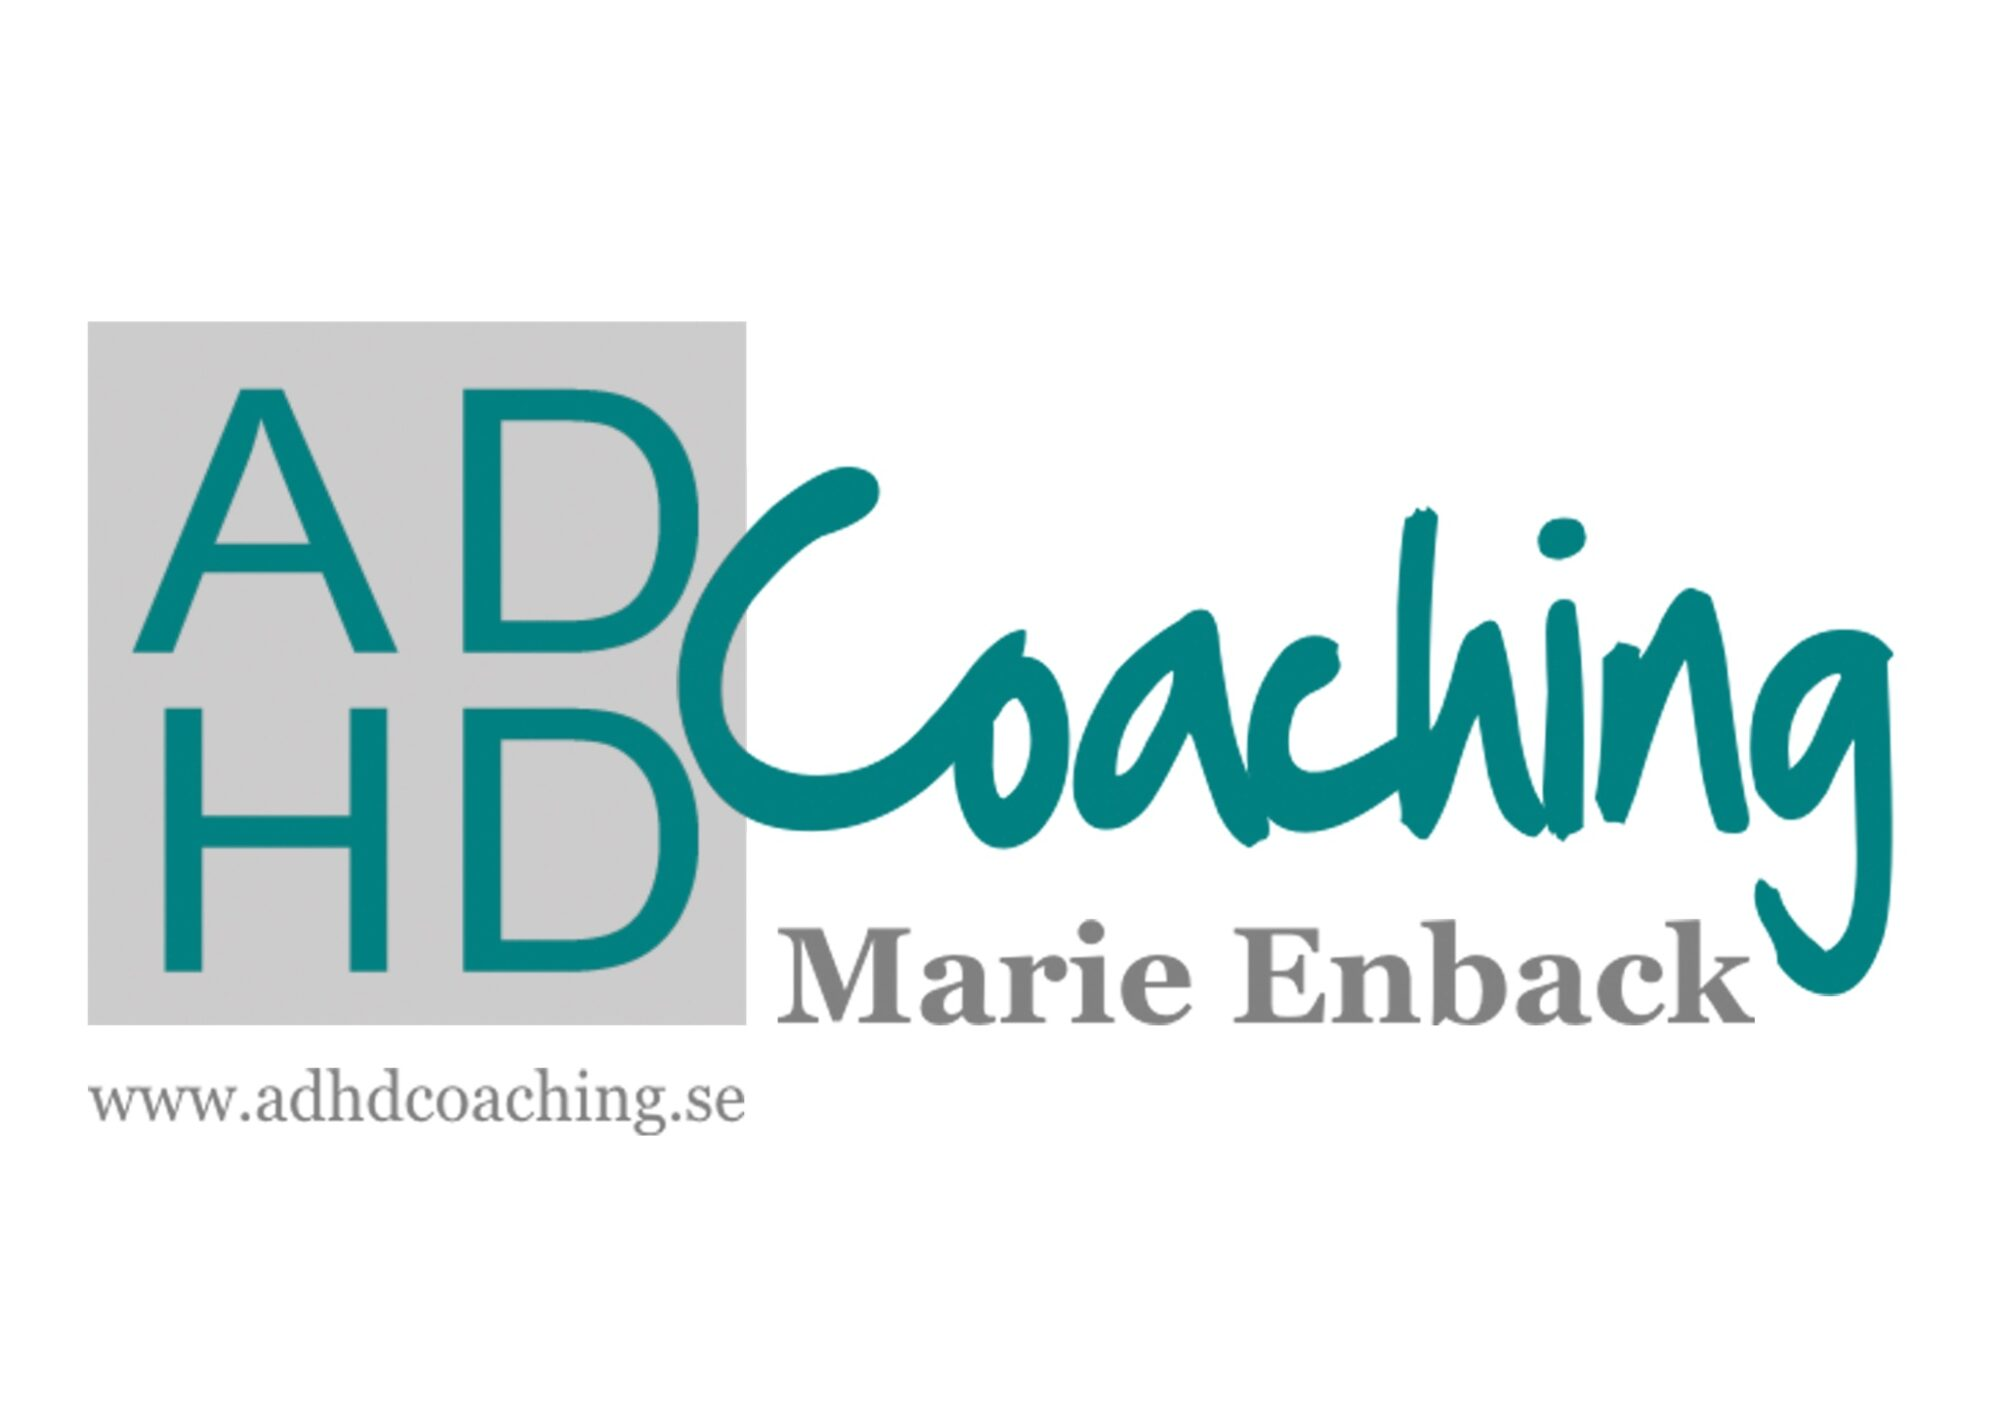 ADHD Coaching Sverige Sweden